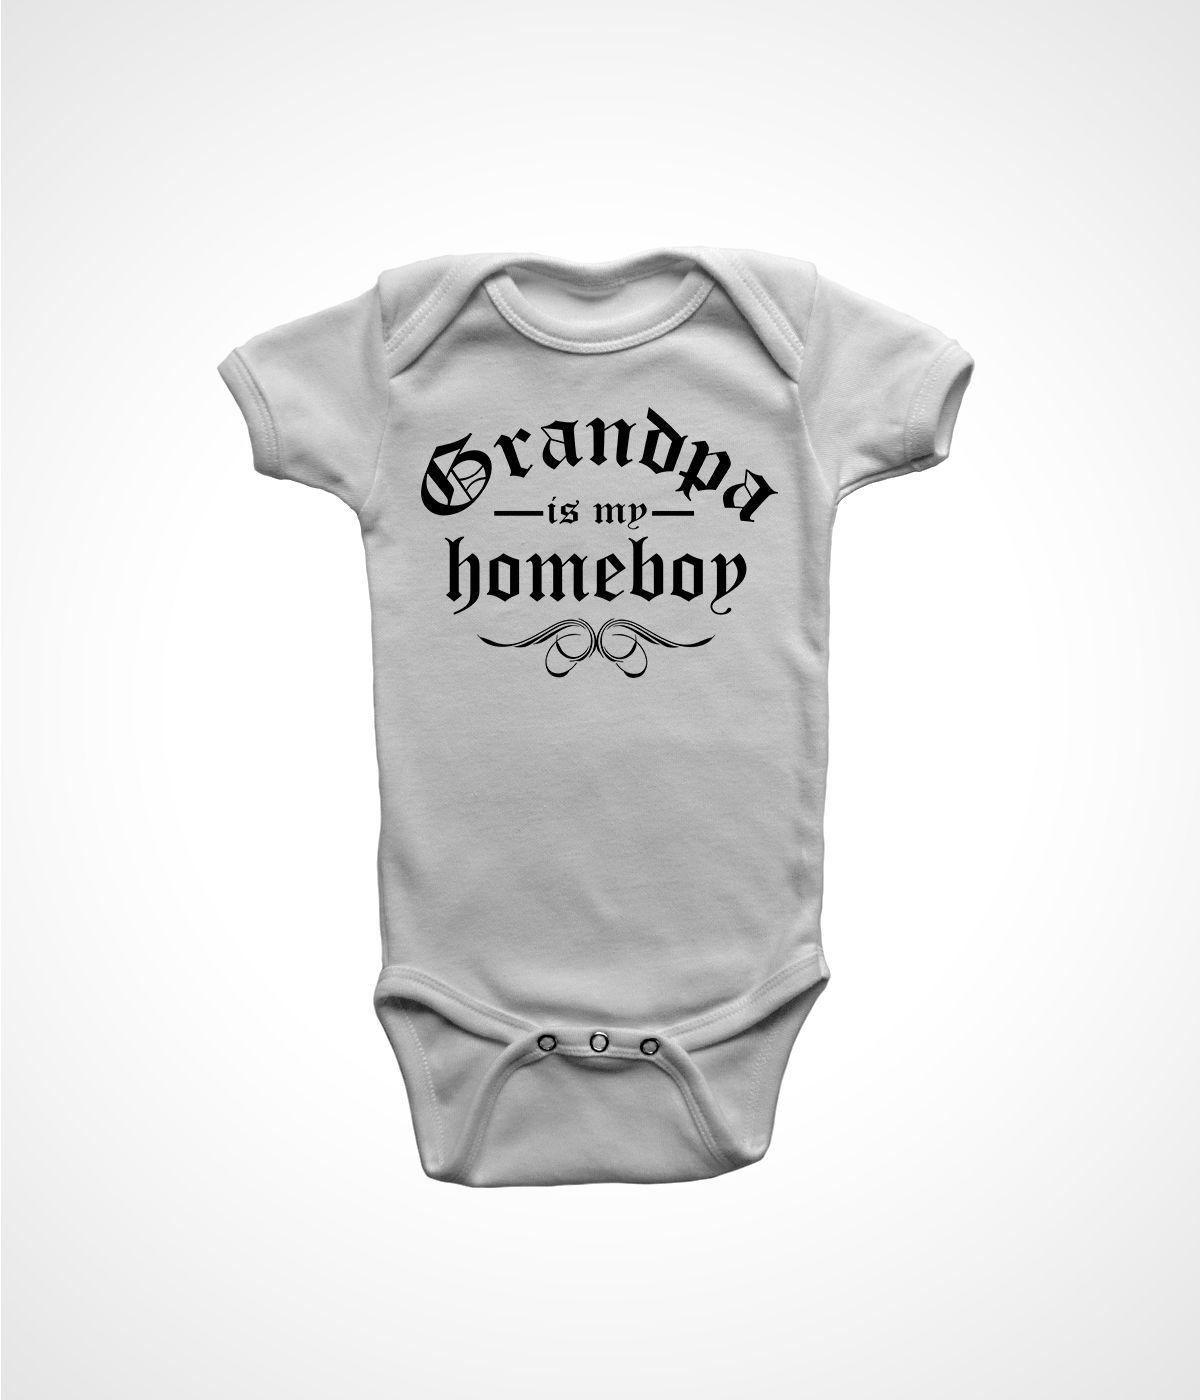 grandpa shirt baby boys infant funny gangster gift for ...